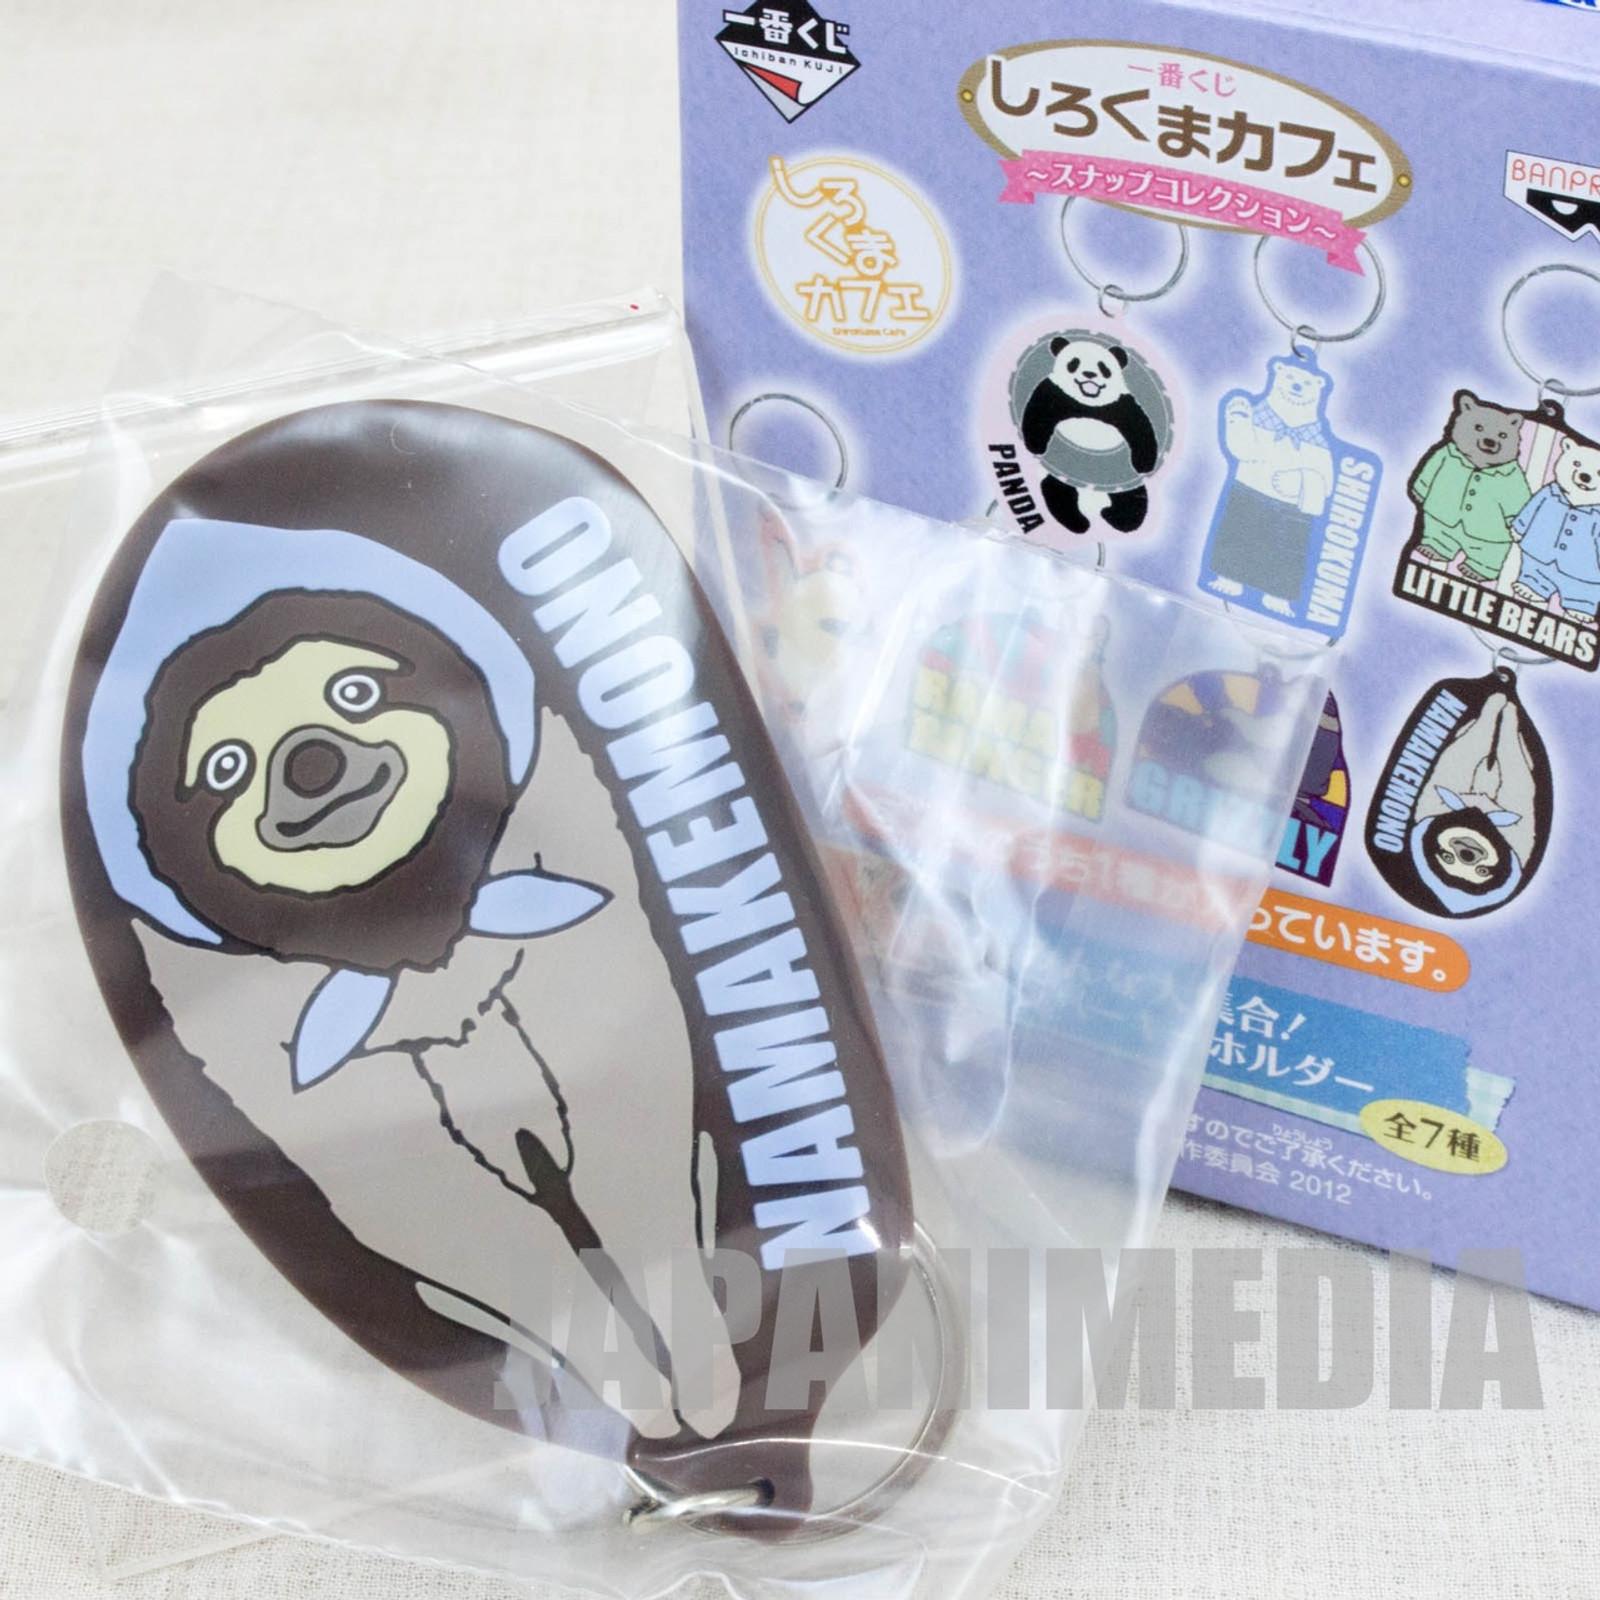 Shirokuma Cafe Sloth (Namakemono) Mascot Rubber Key Chain JAPAN ANIME